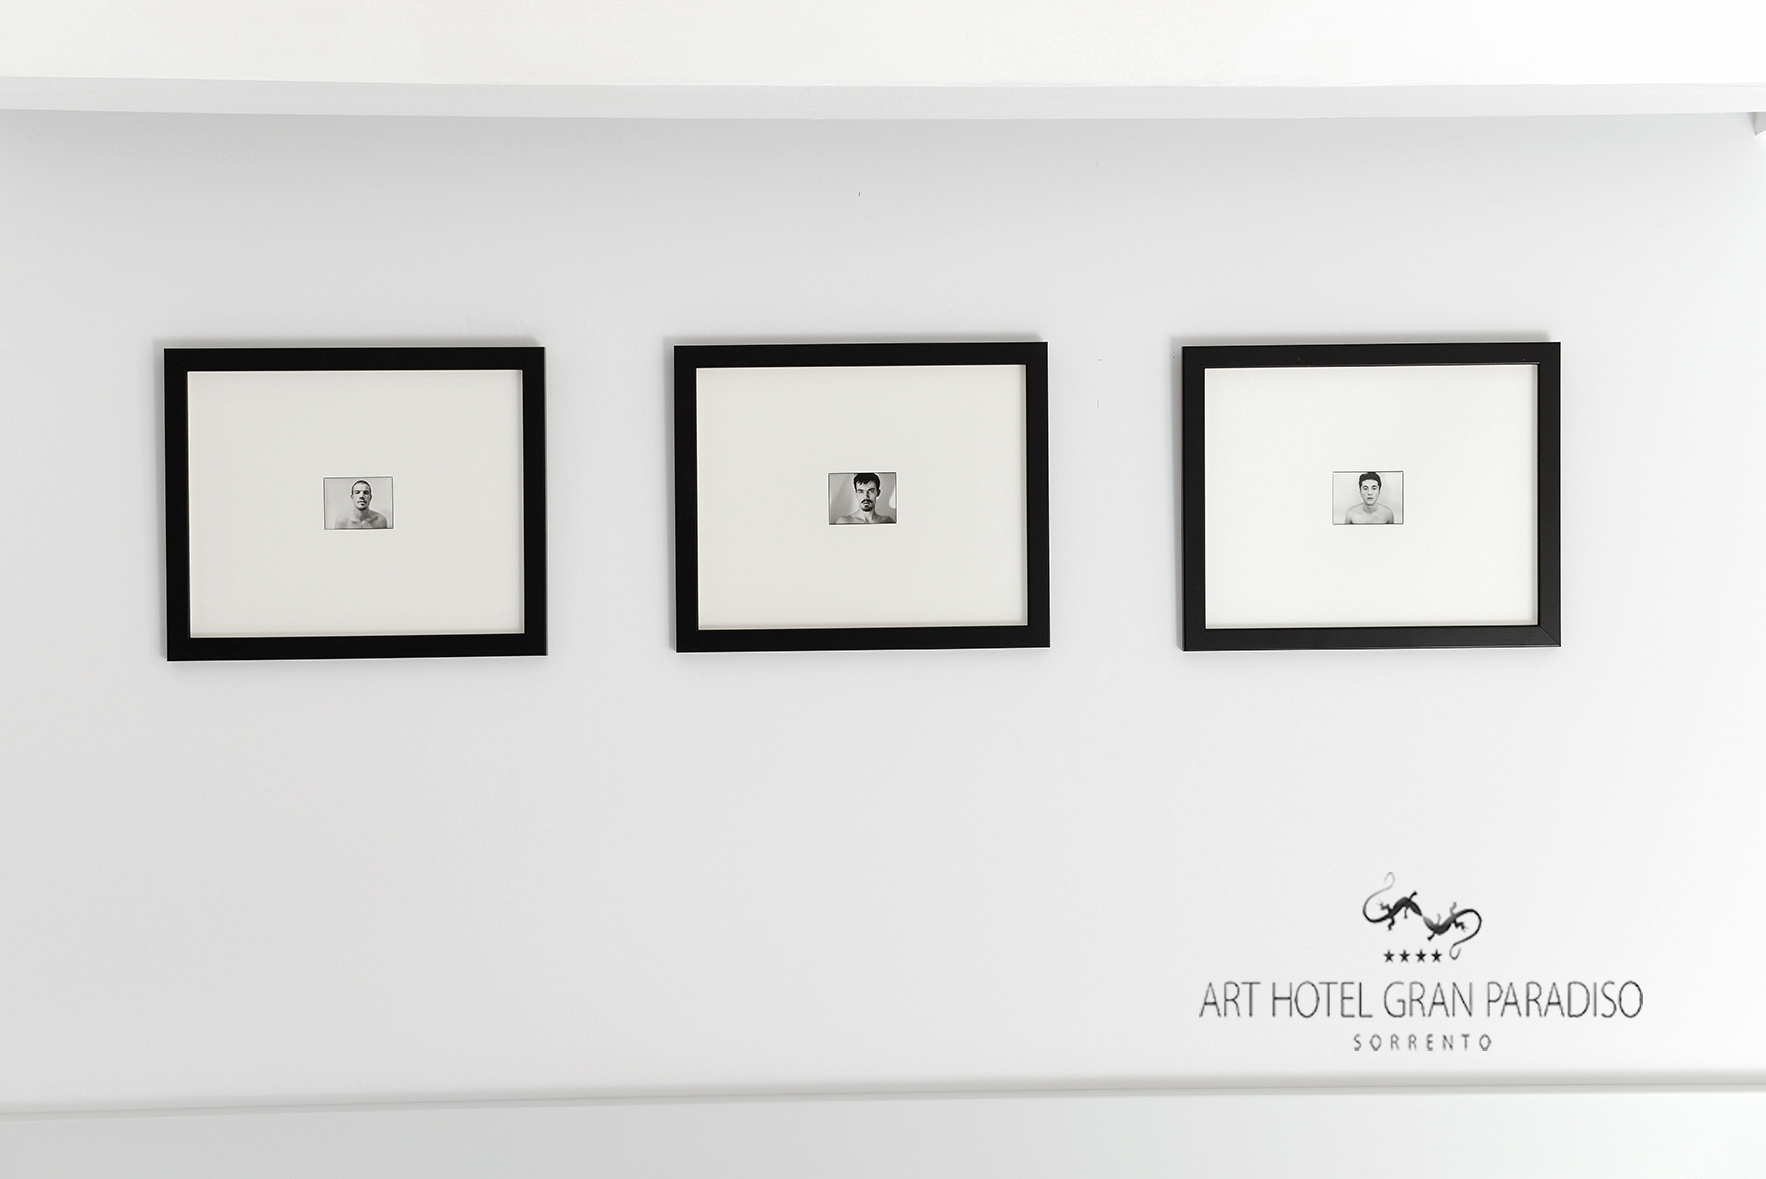 Art_Hotel_Gran_Paradiso_2013_412_Luca_Massimo_Barbero_2.jpg